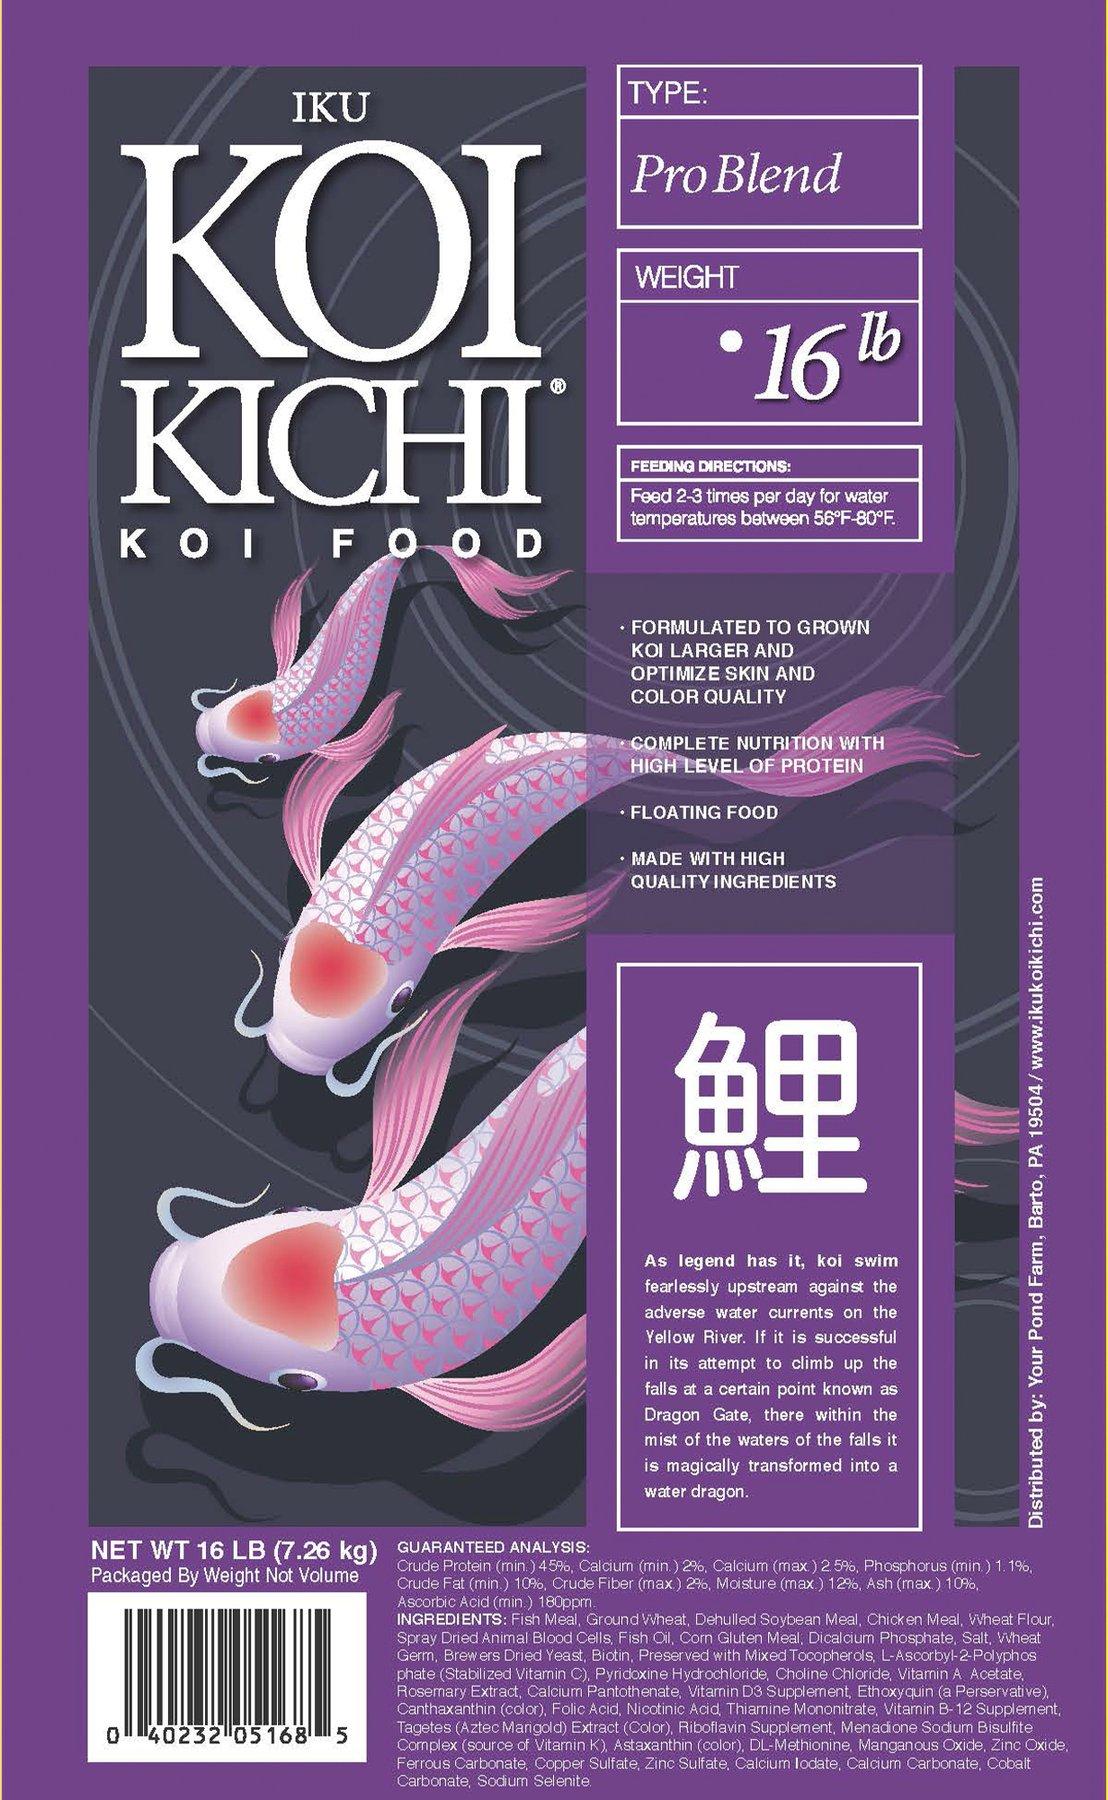 Iku Koi Kichi Pro Blend Koi Fish Food